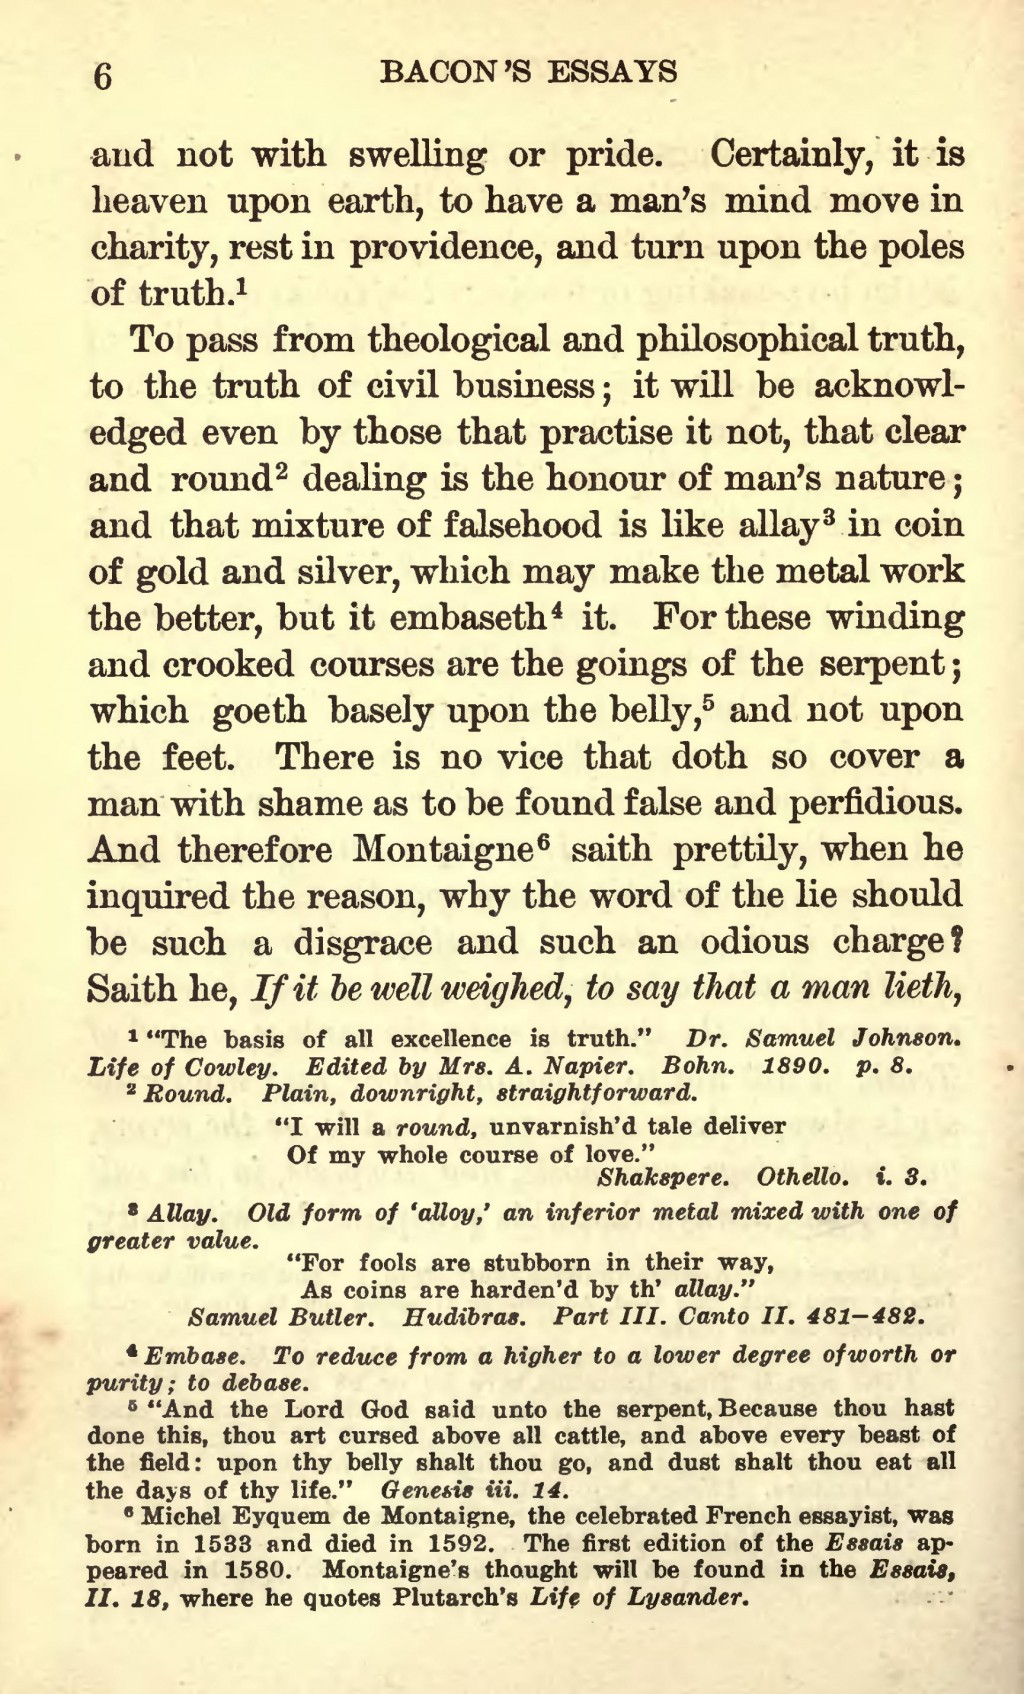 009 Page116 1728px Of Francis Bacon 1908 Scott Djvu Essay Example Bacons Amazing Essays Google Books Truth Quiz Bacon's Summary Large